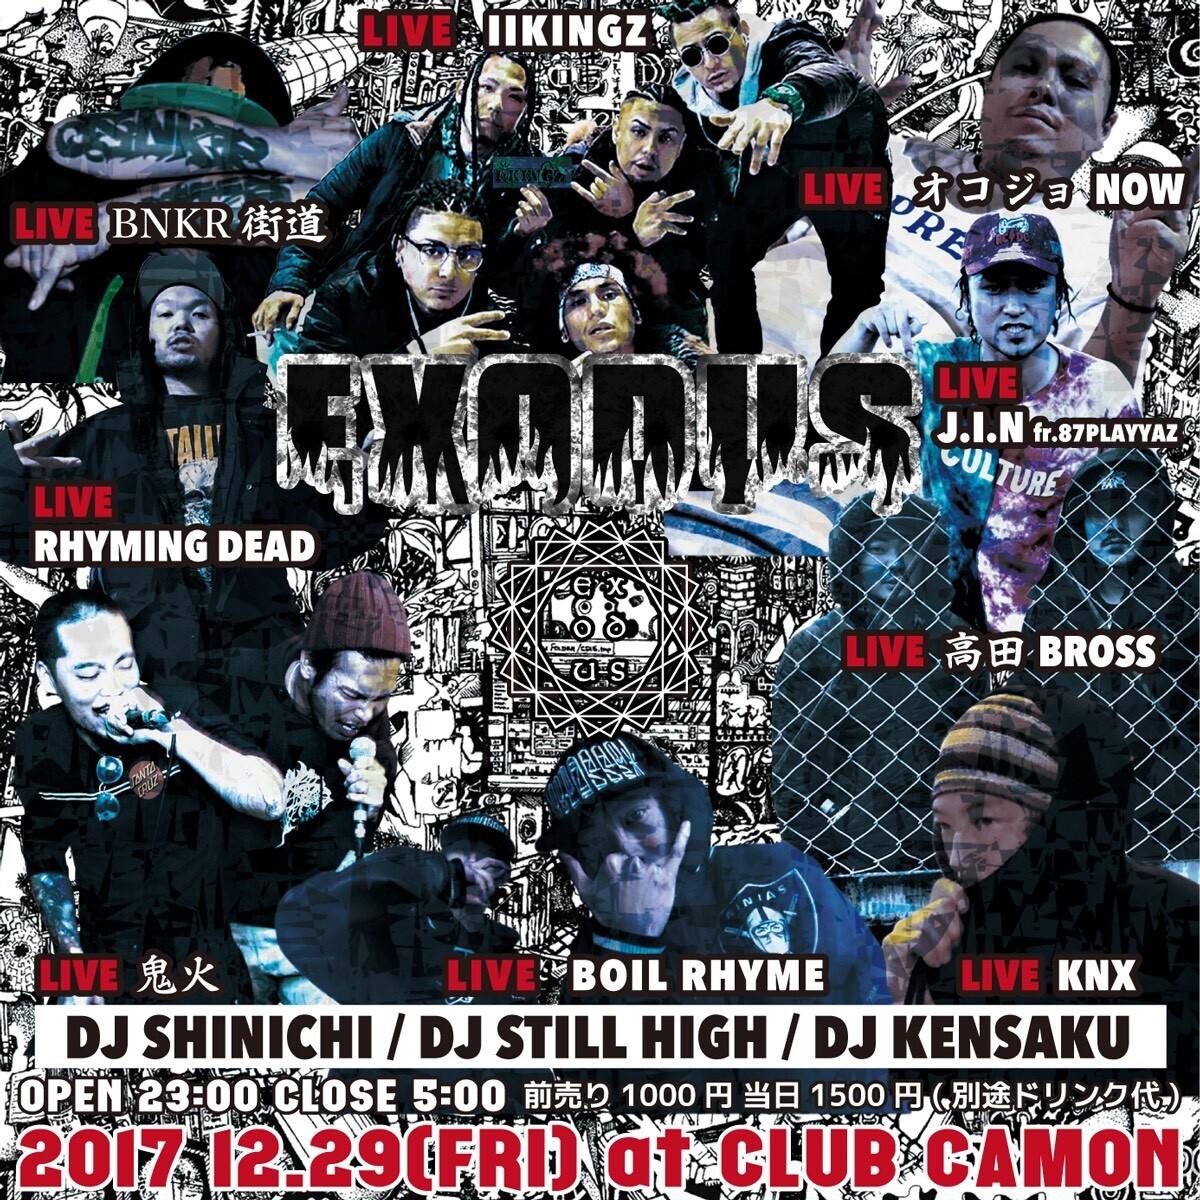 iFLYER: 【EXODUS】12/29(金)☆オコジョNOW、BOIL RHYME、鬼火、KNX